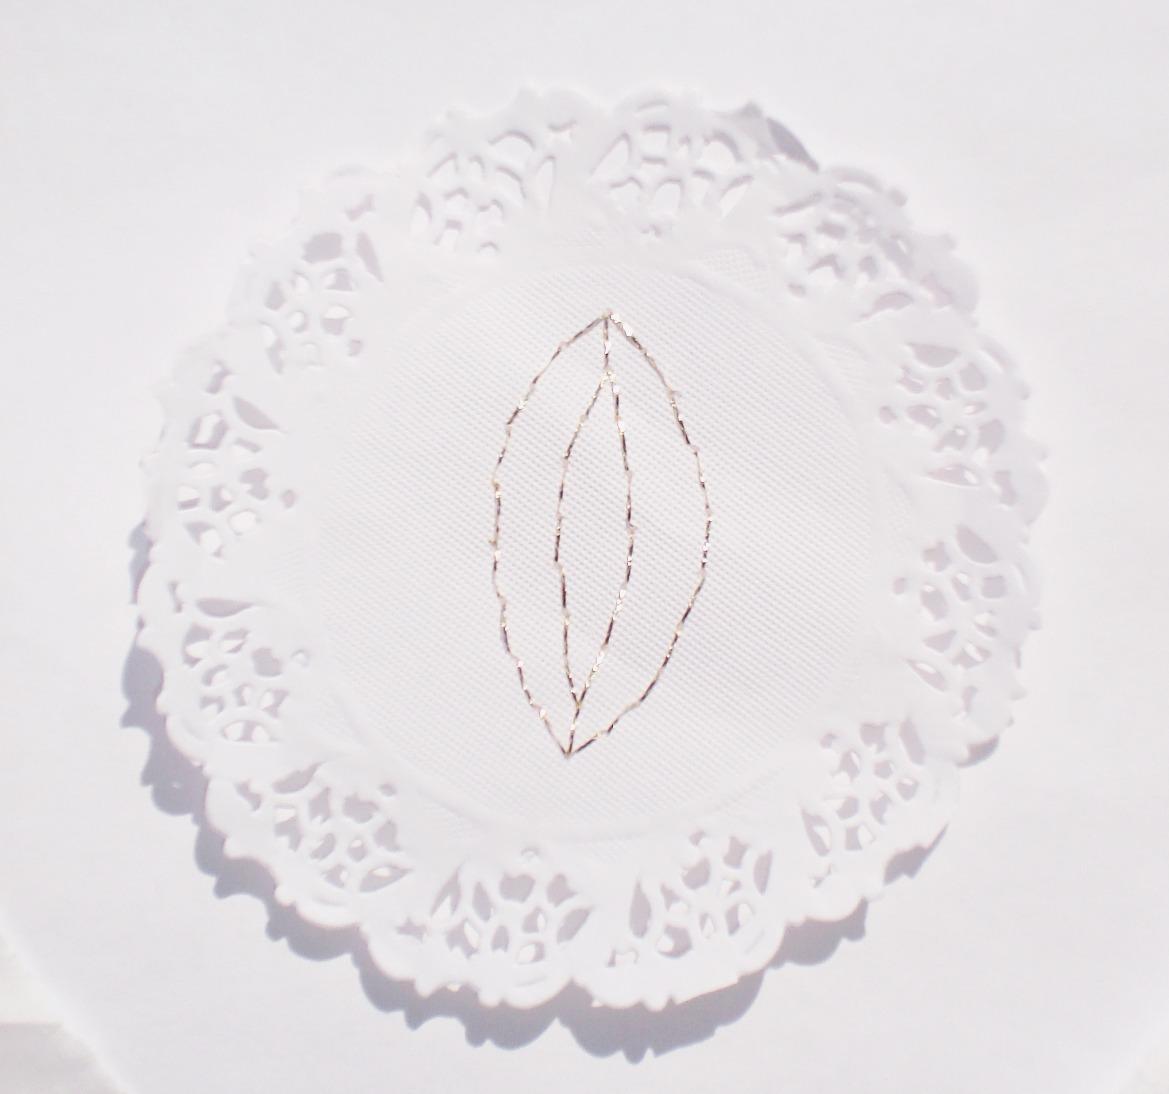 Assenta-dores II (Detalhe)